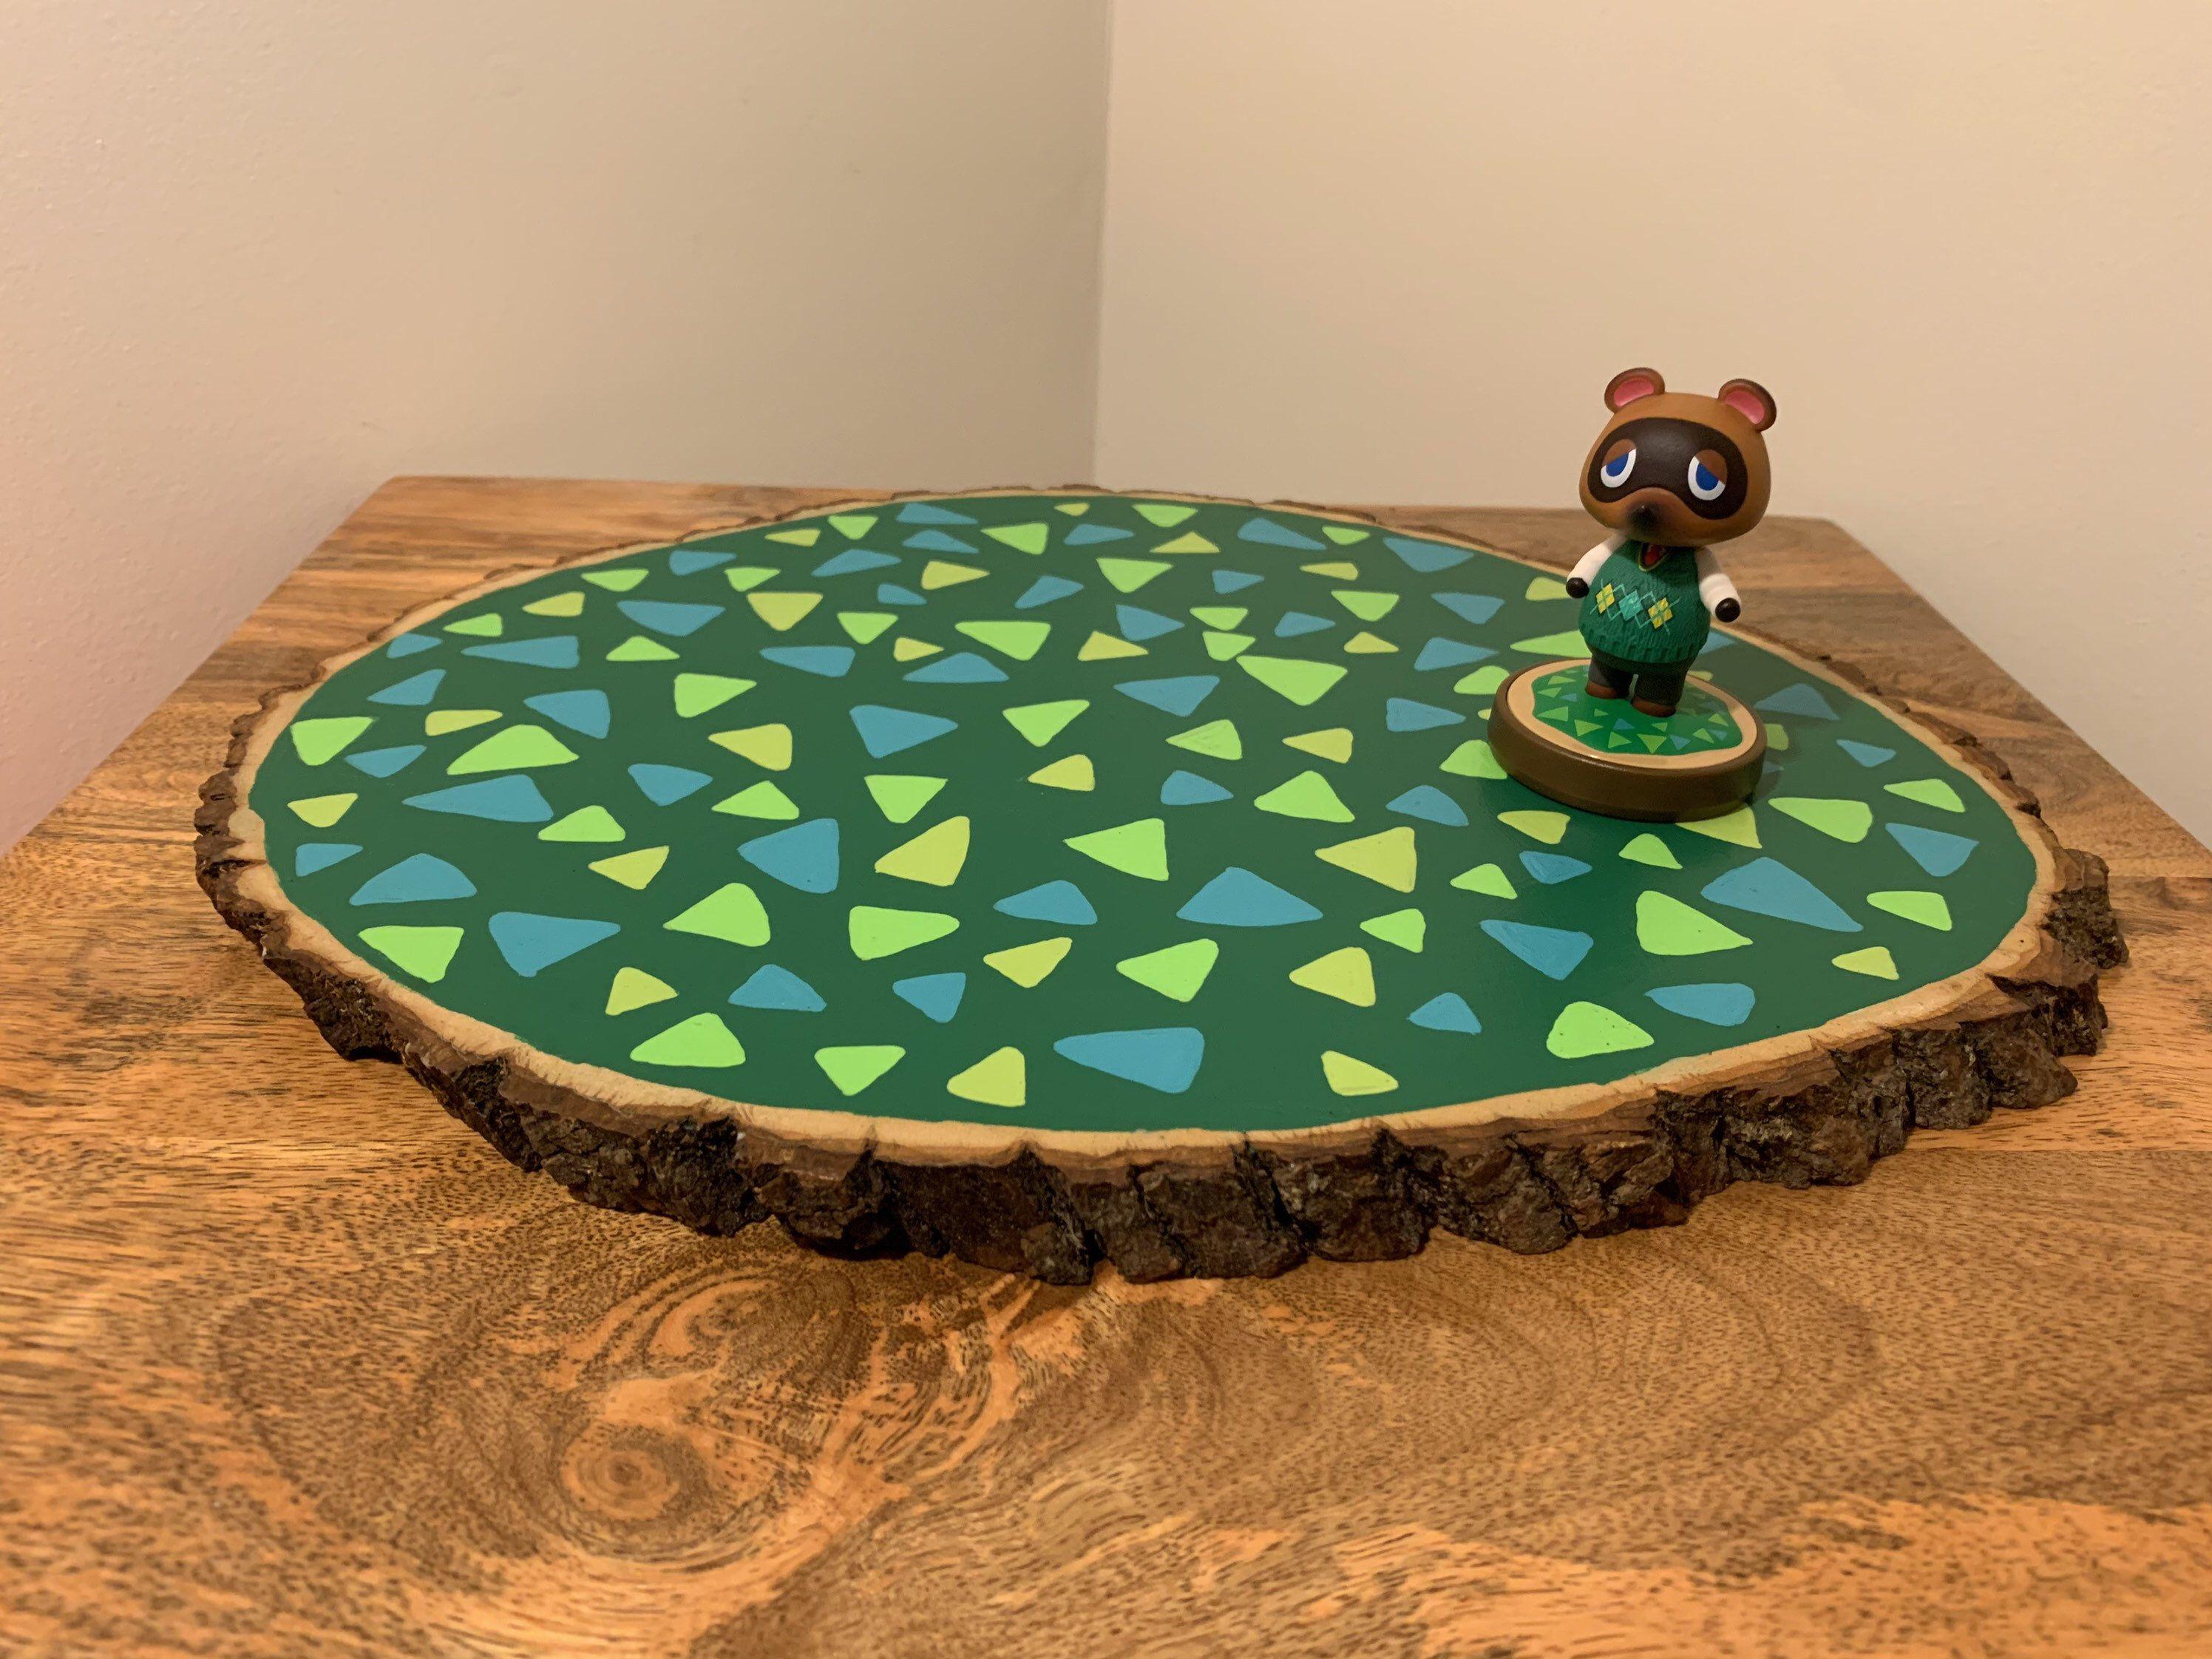 Animal Crossing Inspired Wooden Amiibo Platform Large Etsy Amiibo Display Amiibo Animal Crossing